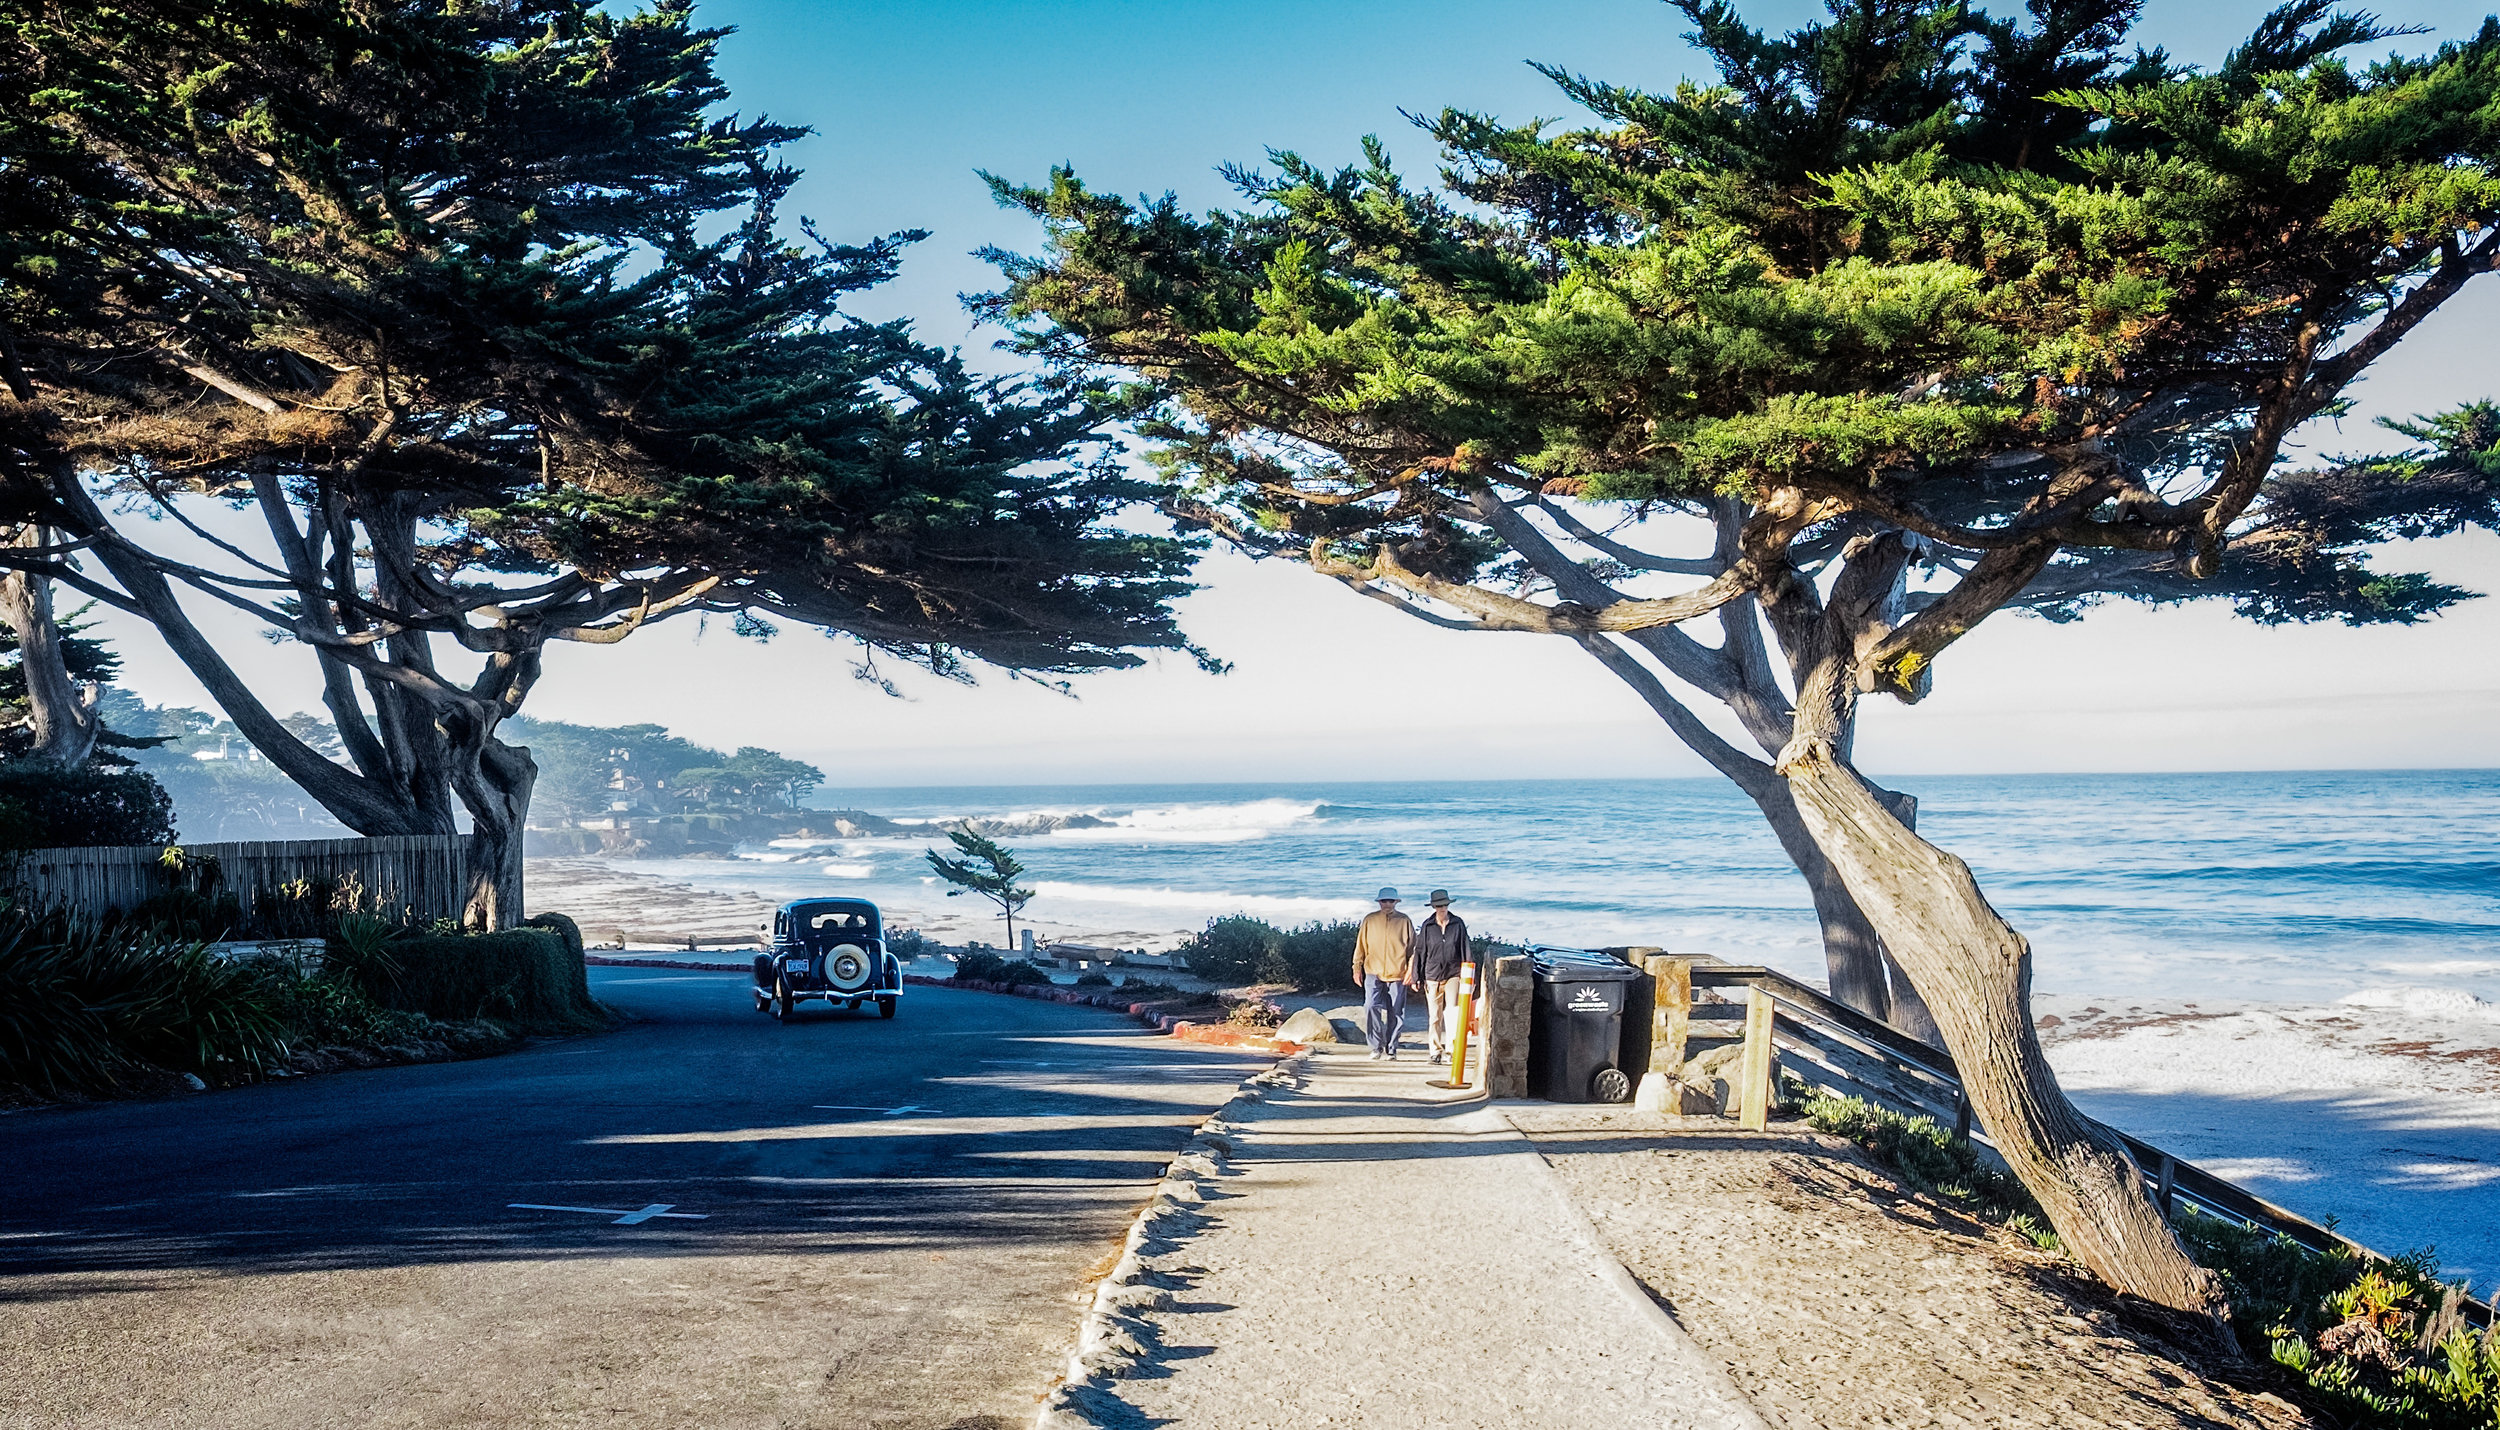 Carmel by the Sea - Old Car copy.jpg